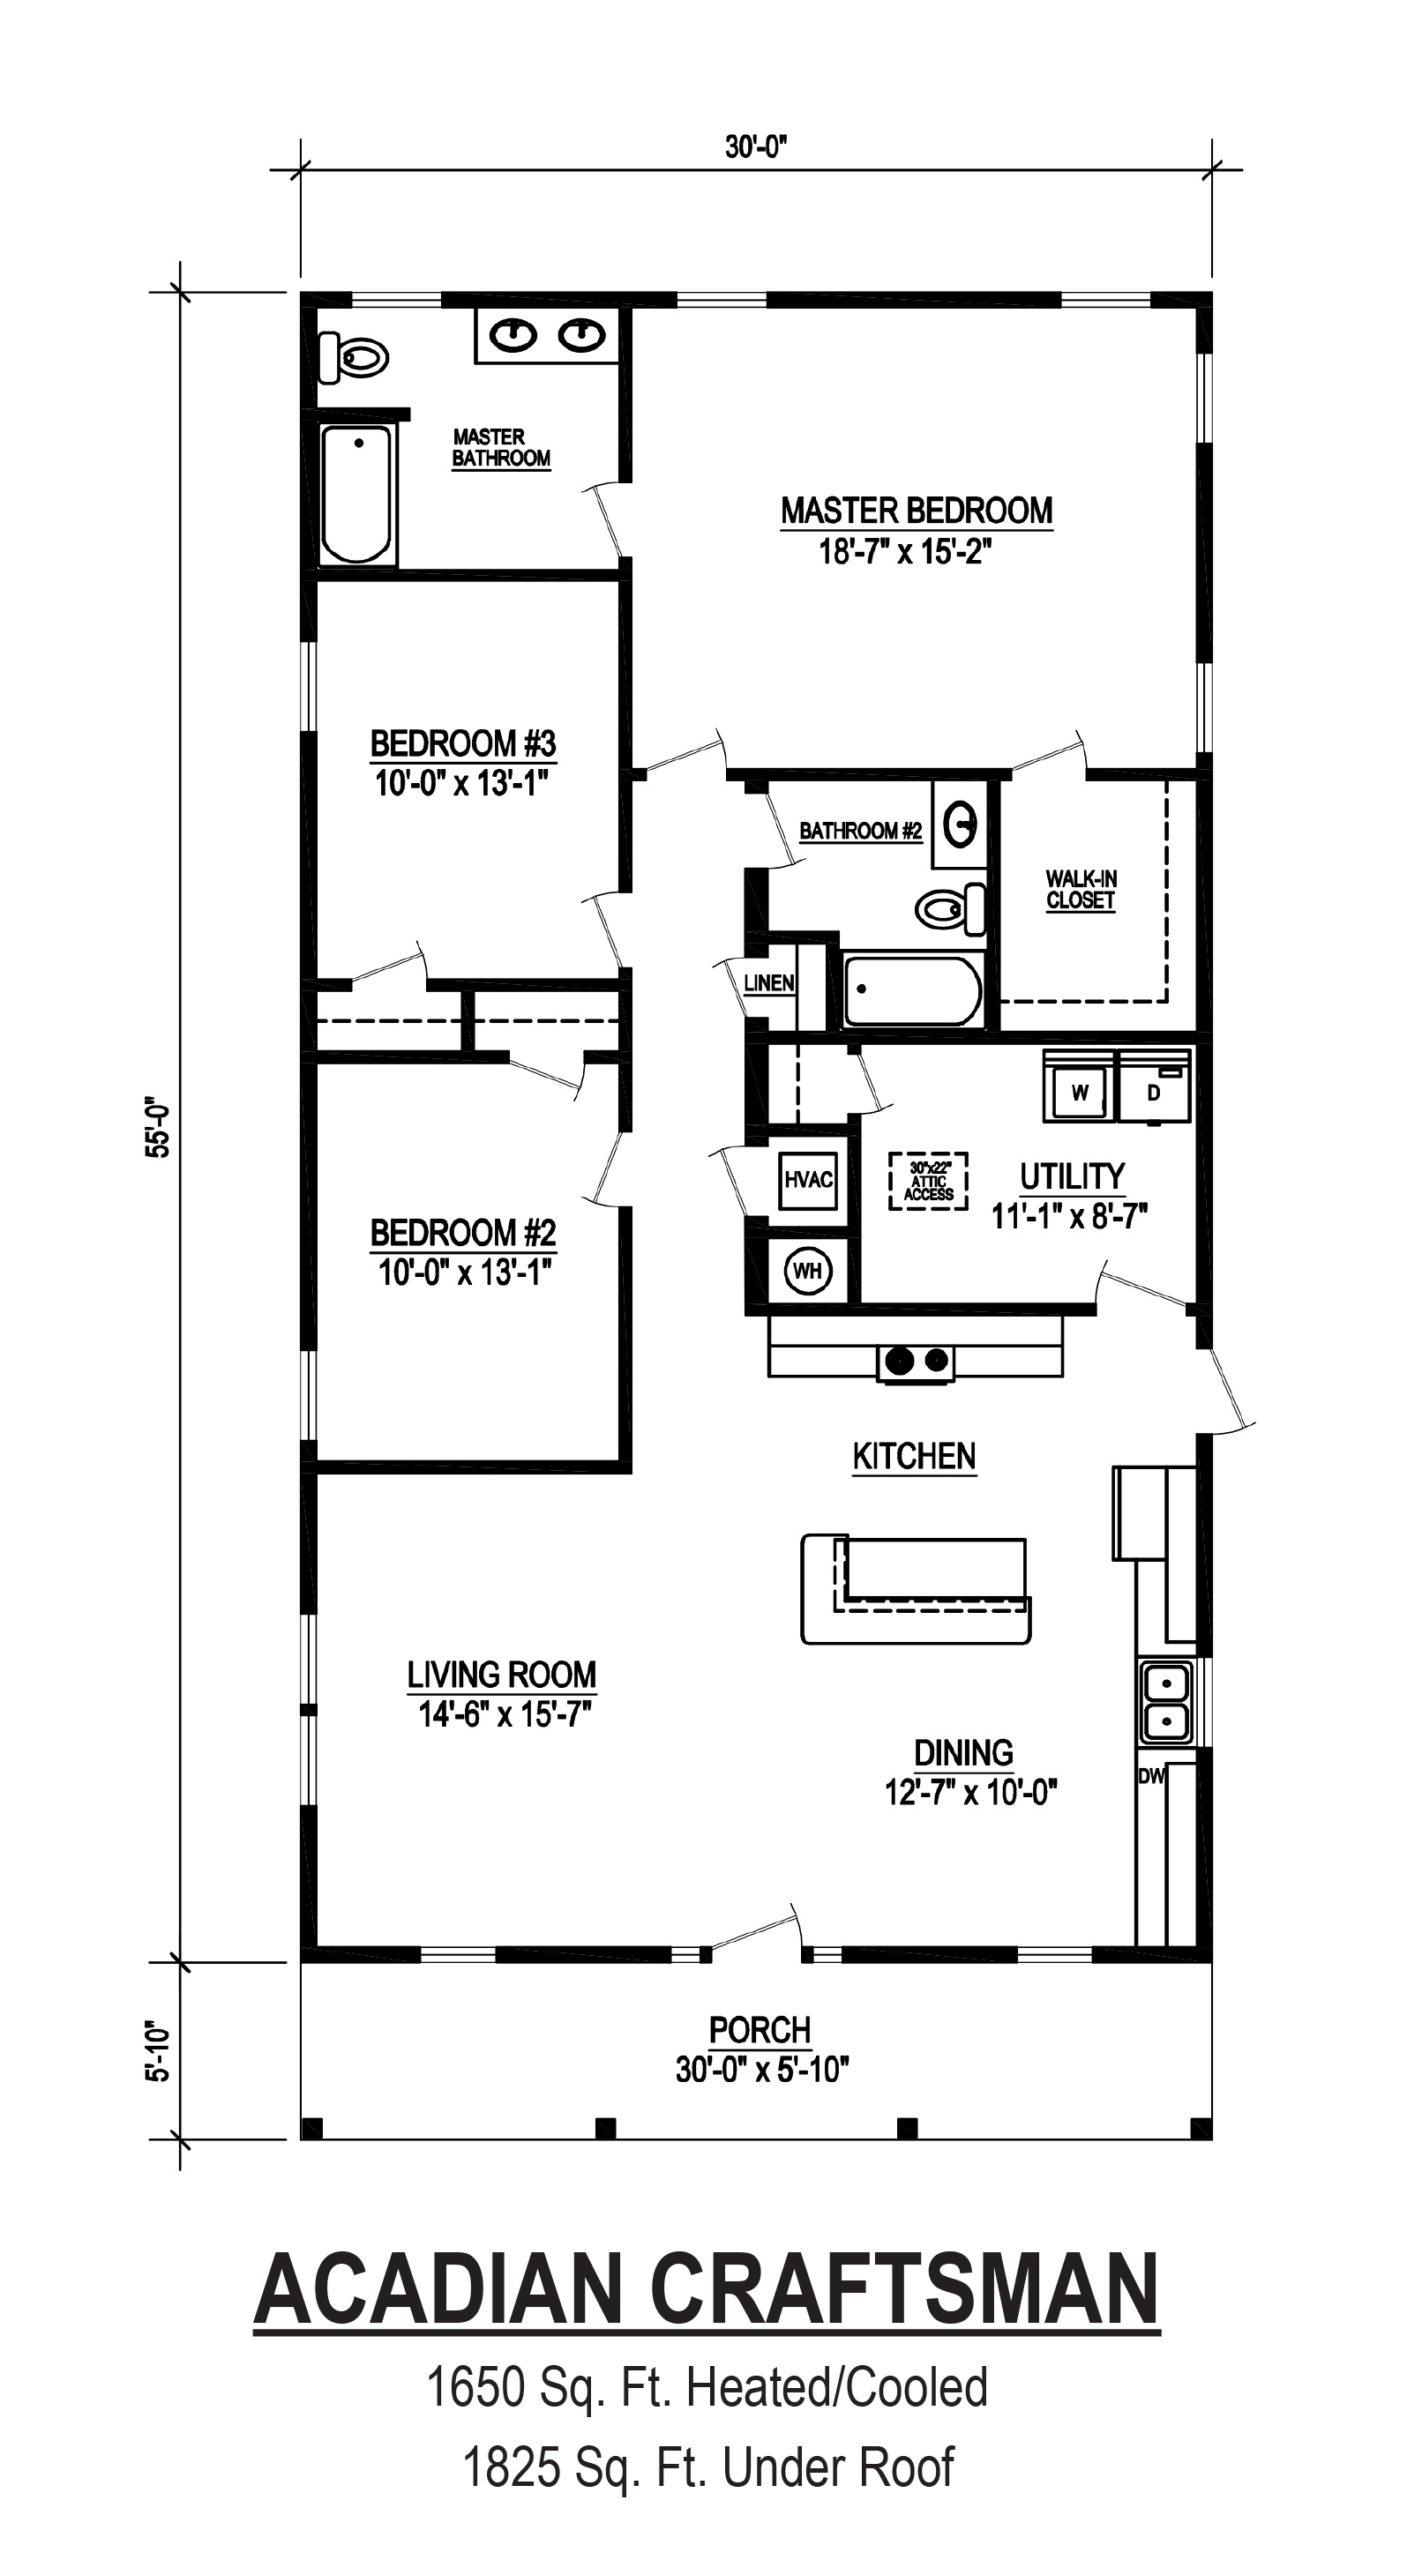 acadian craftsman modular home floor plan